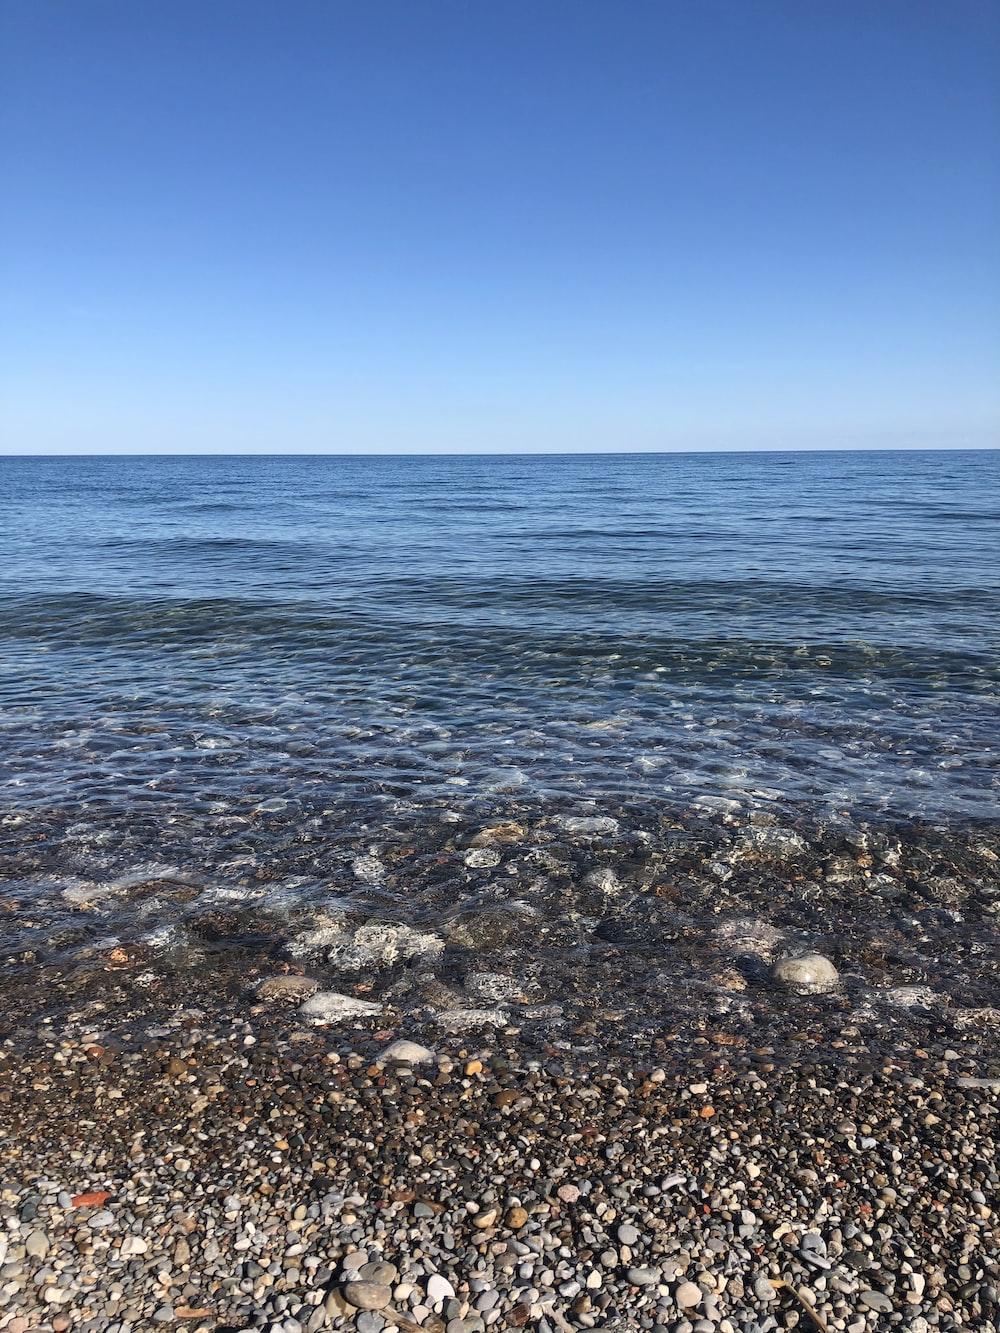 blue sea under blue sky during daytime